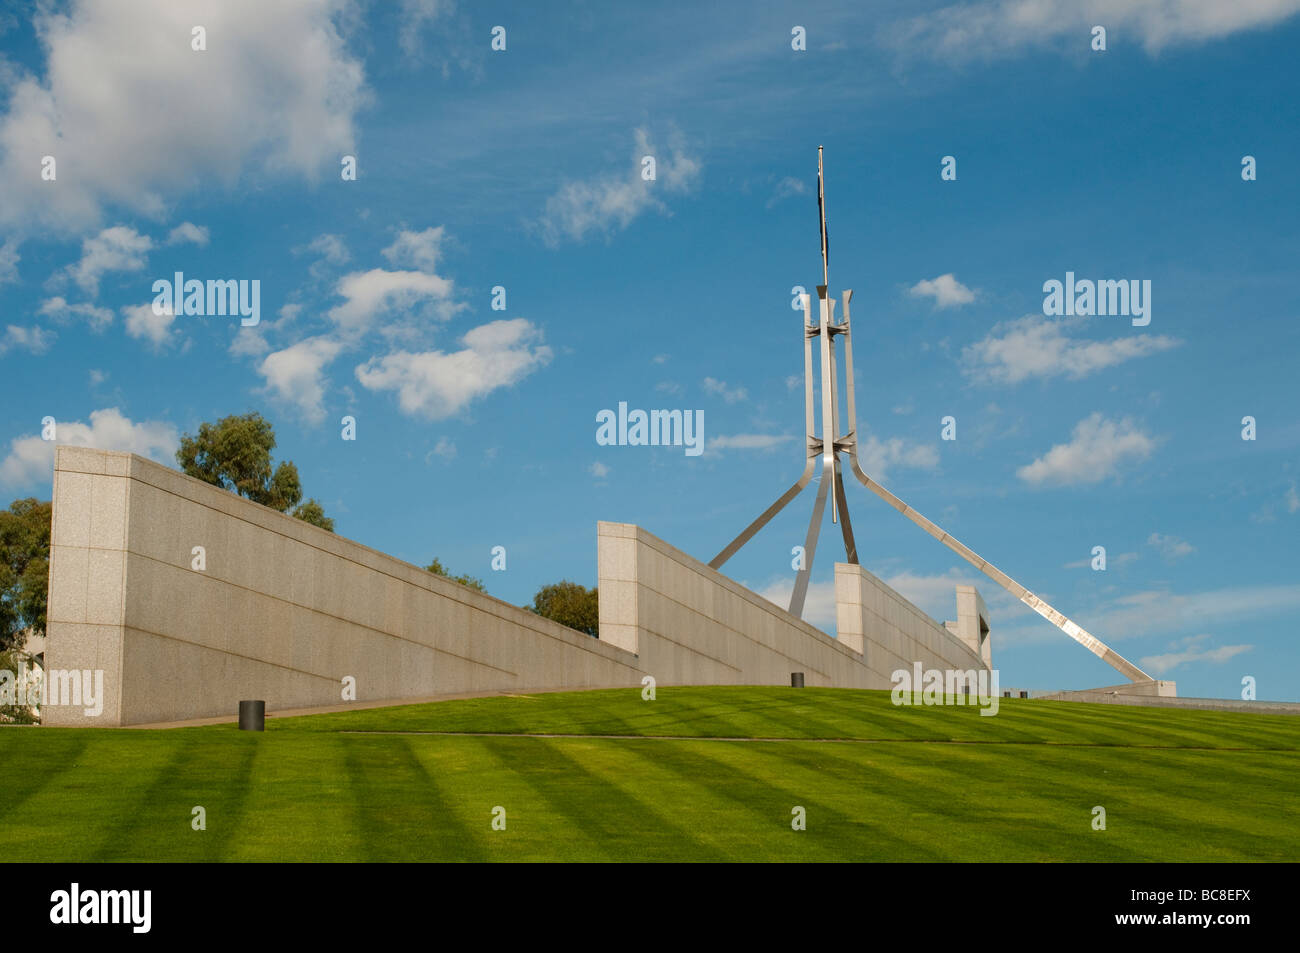 New Parliament House flagpole, Canberra, ACT, Australia - Stock Image